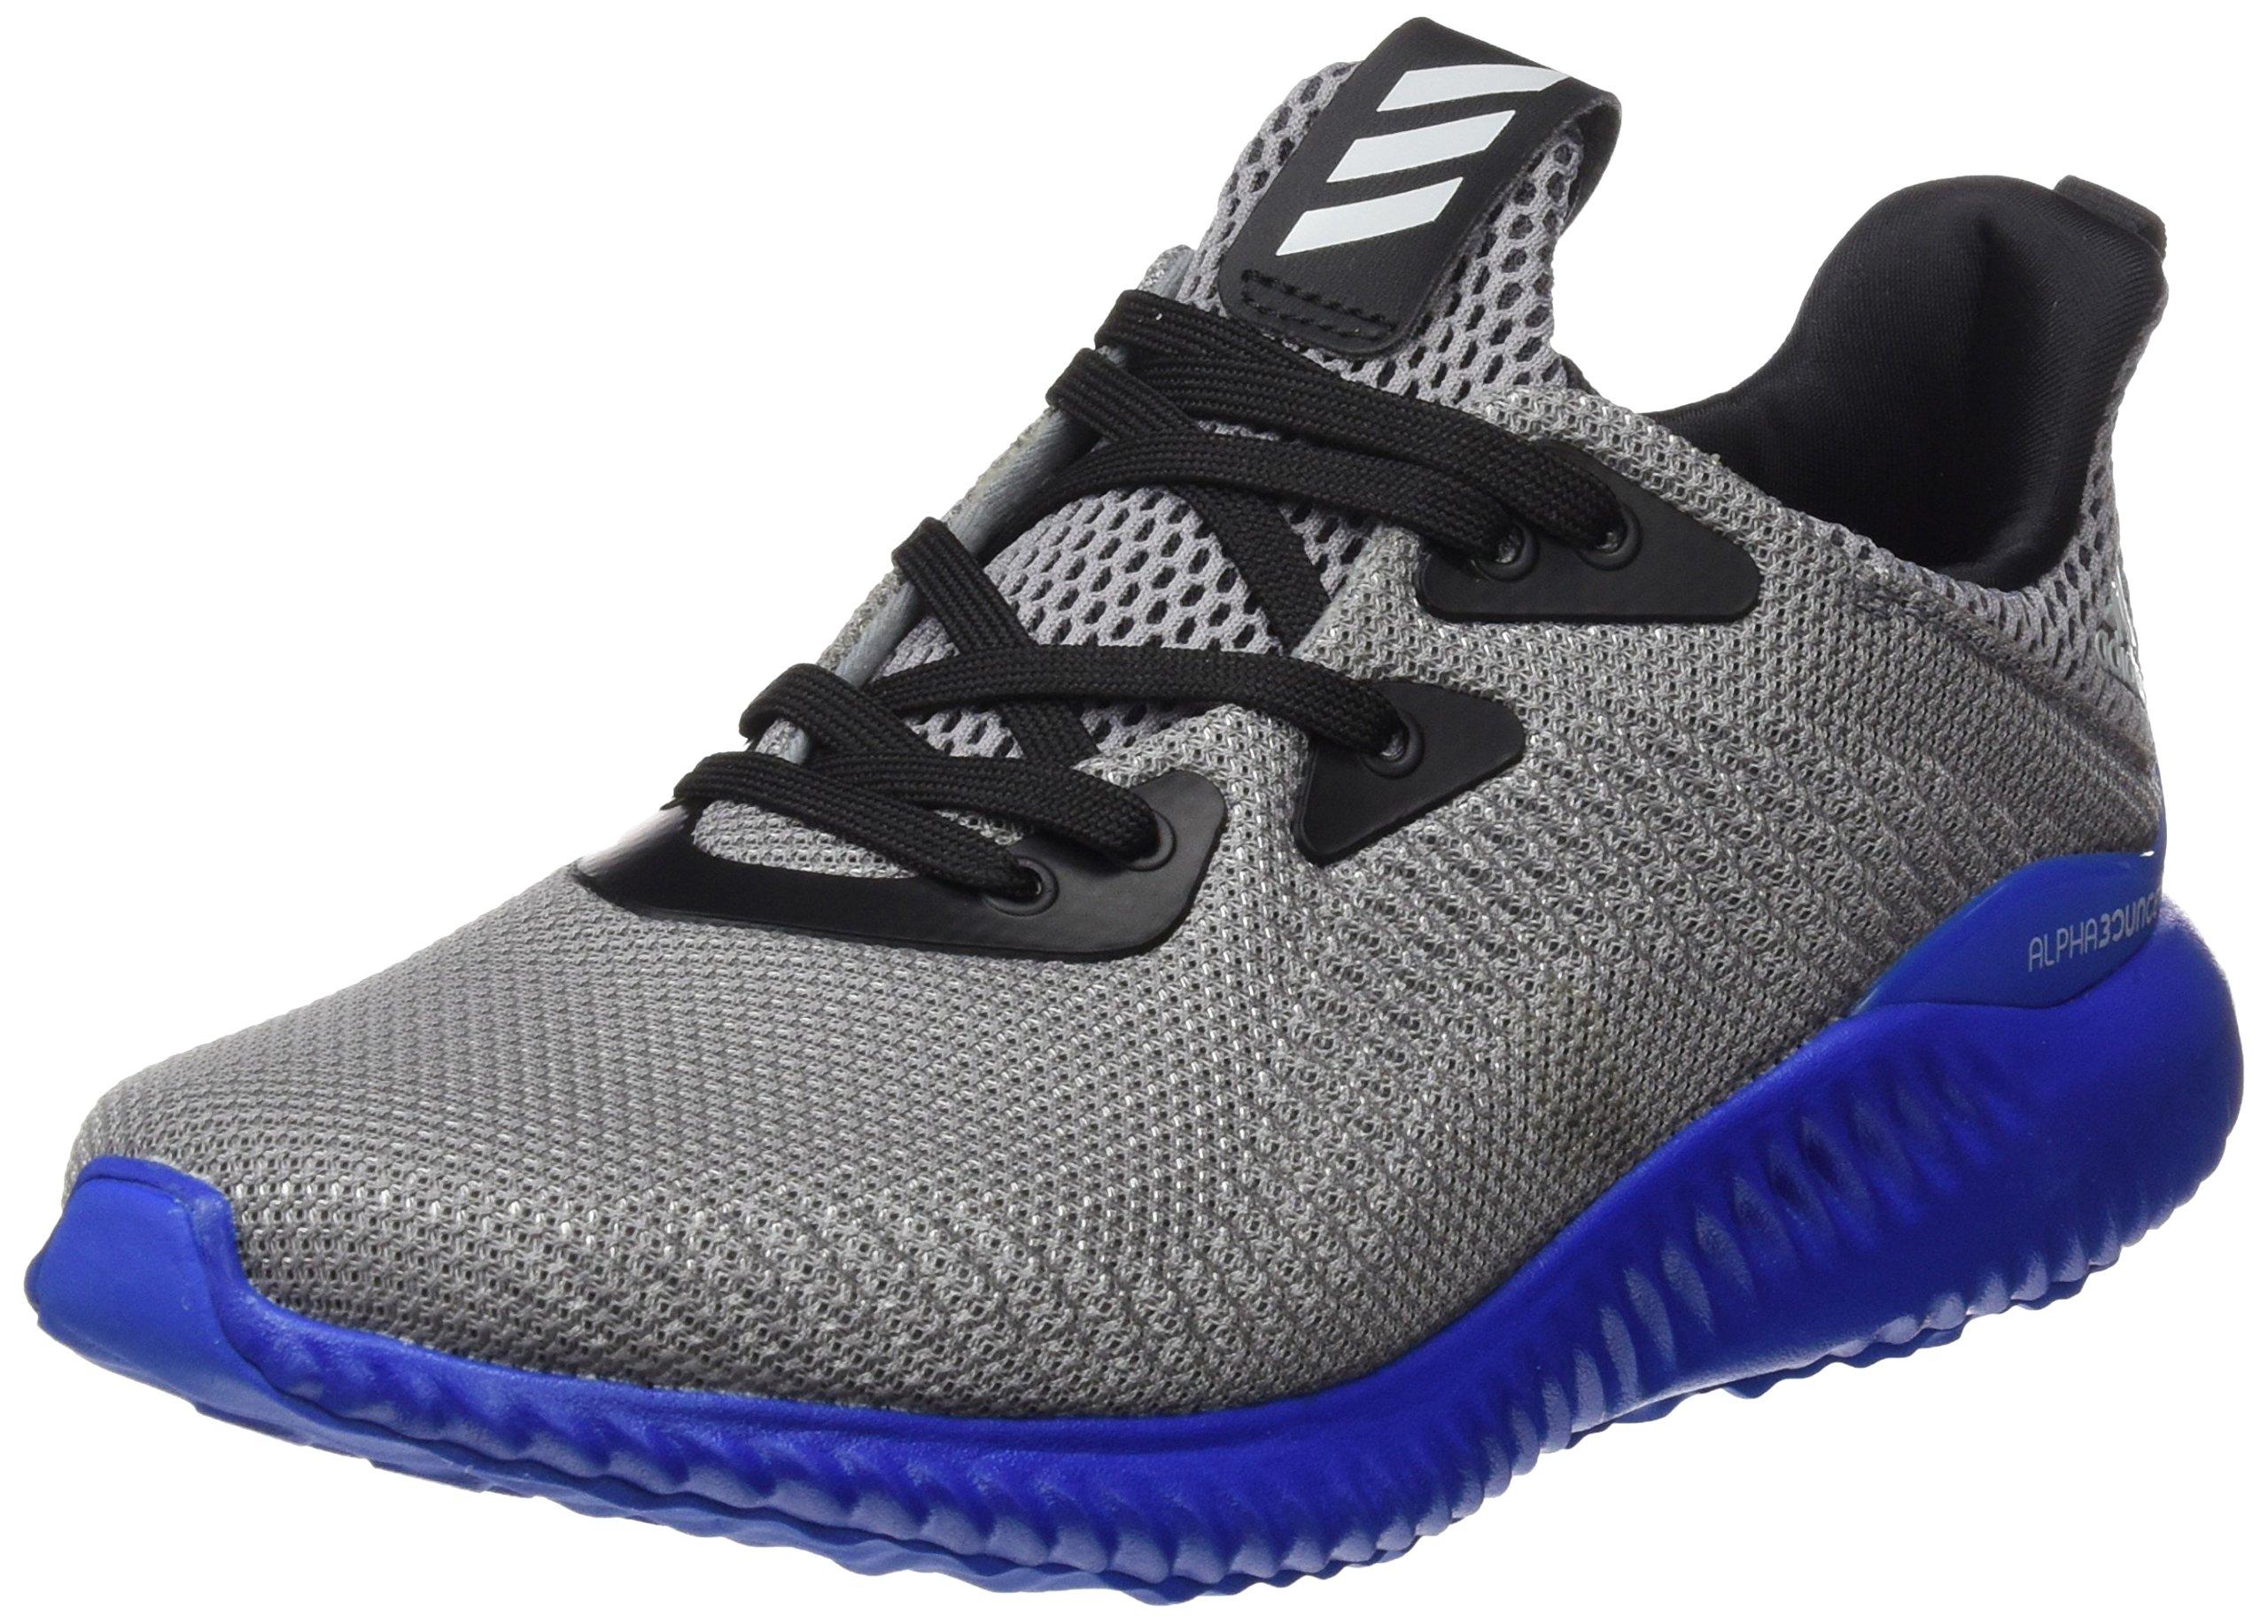 adidas Boy's Alphabounce Trainers US5 Grey